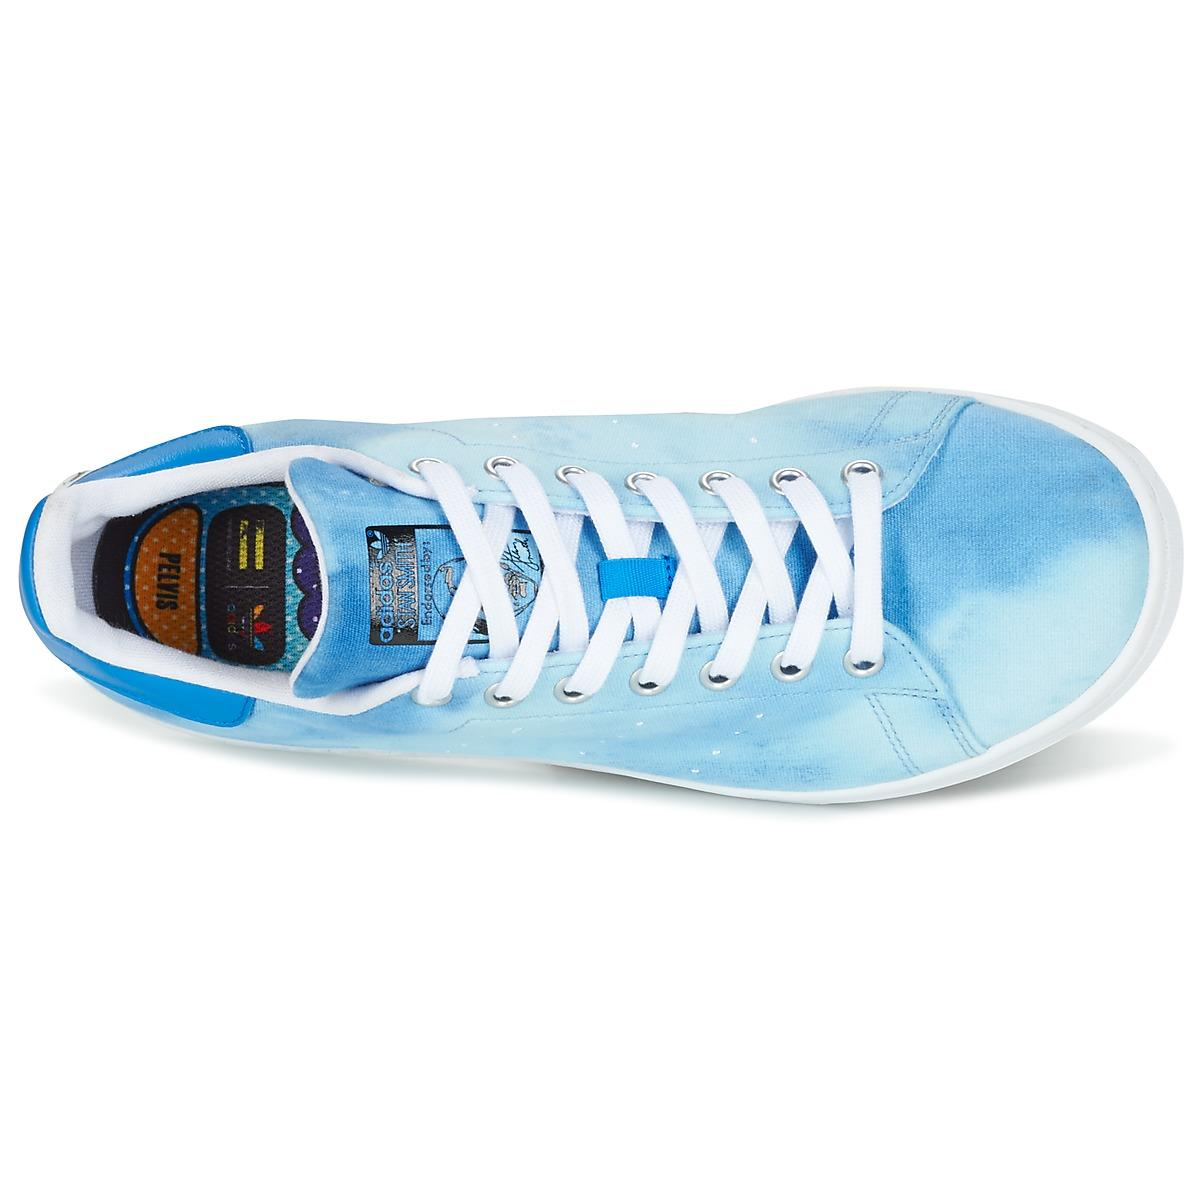 STAN SMITH PHARRELL WILLIAMS Chaussures adidas en coloris Bleu